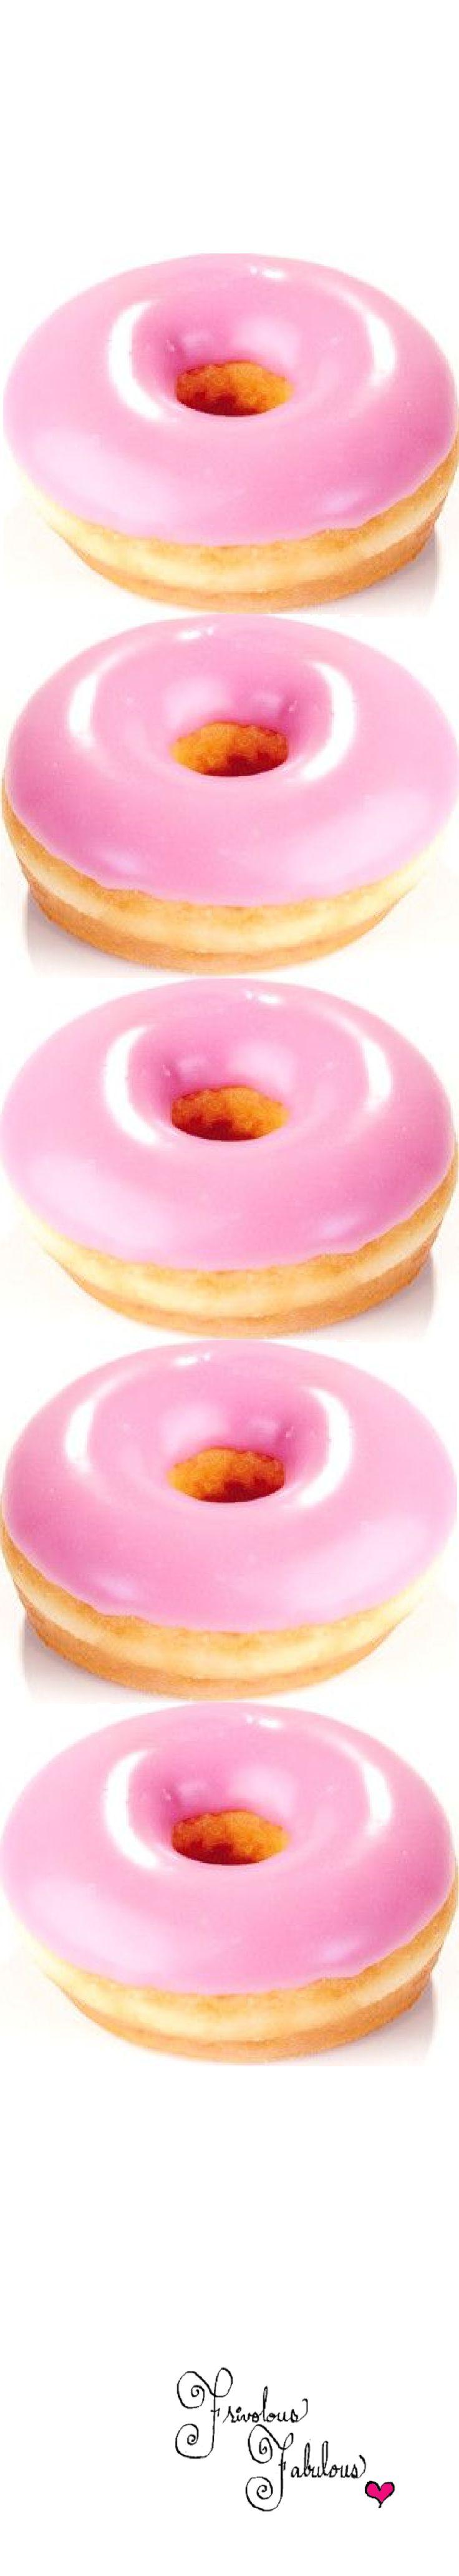 Frivolous Fabulous - Pretty Pink Doughnuts and Pink Hot Chocolate for Everyone! #pink #doughnuts